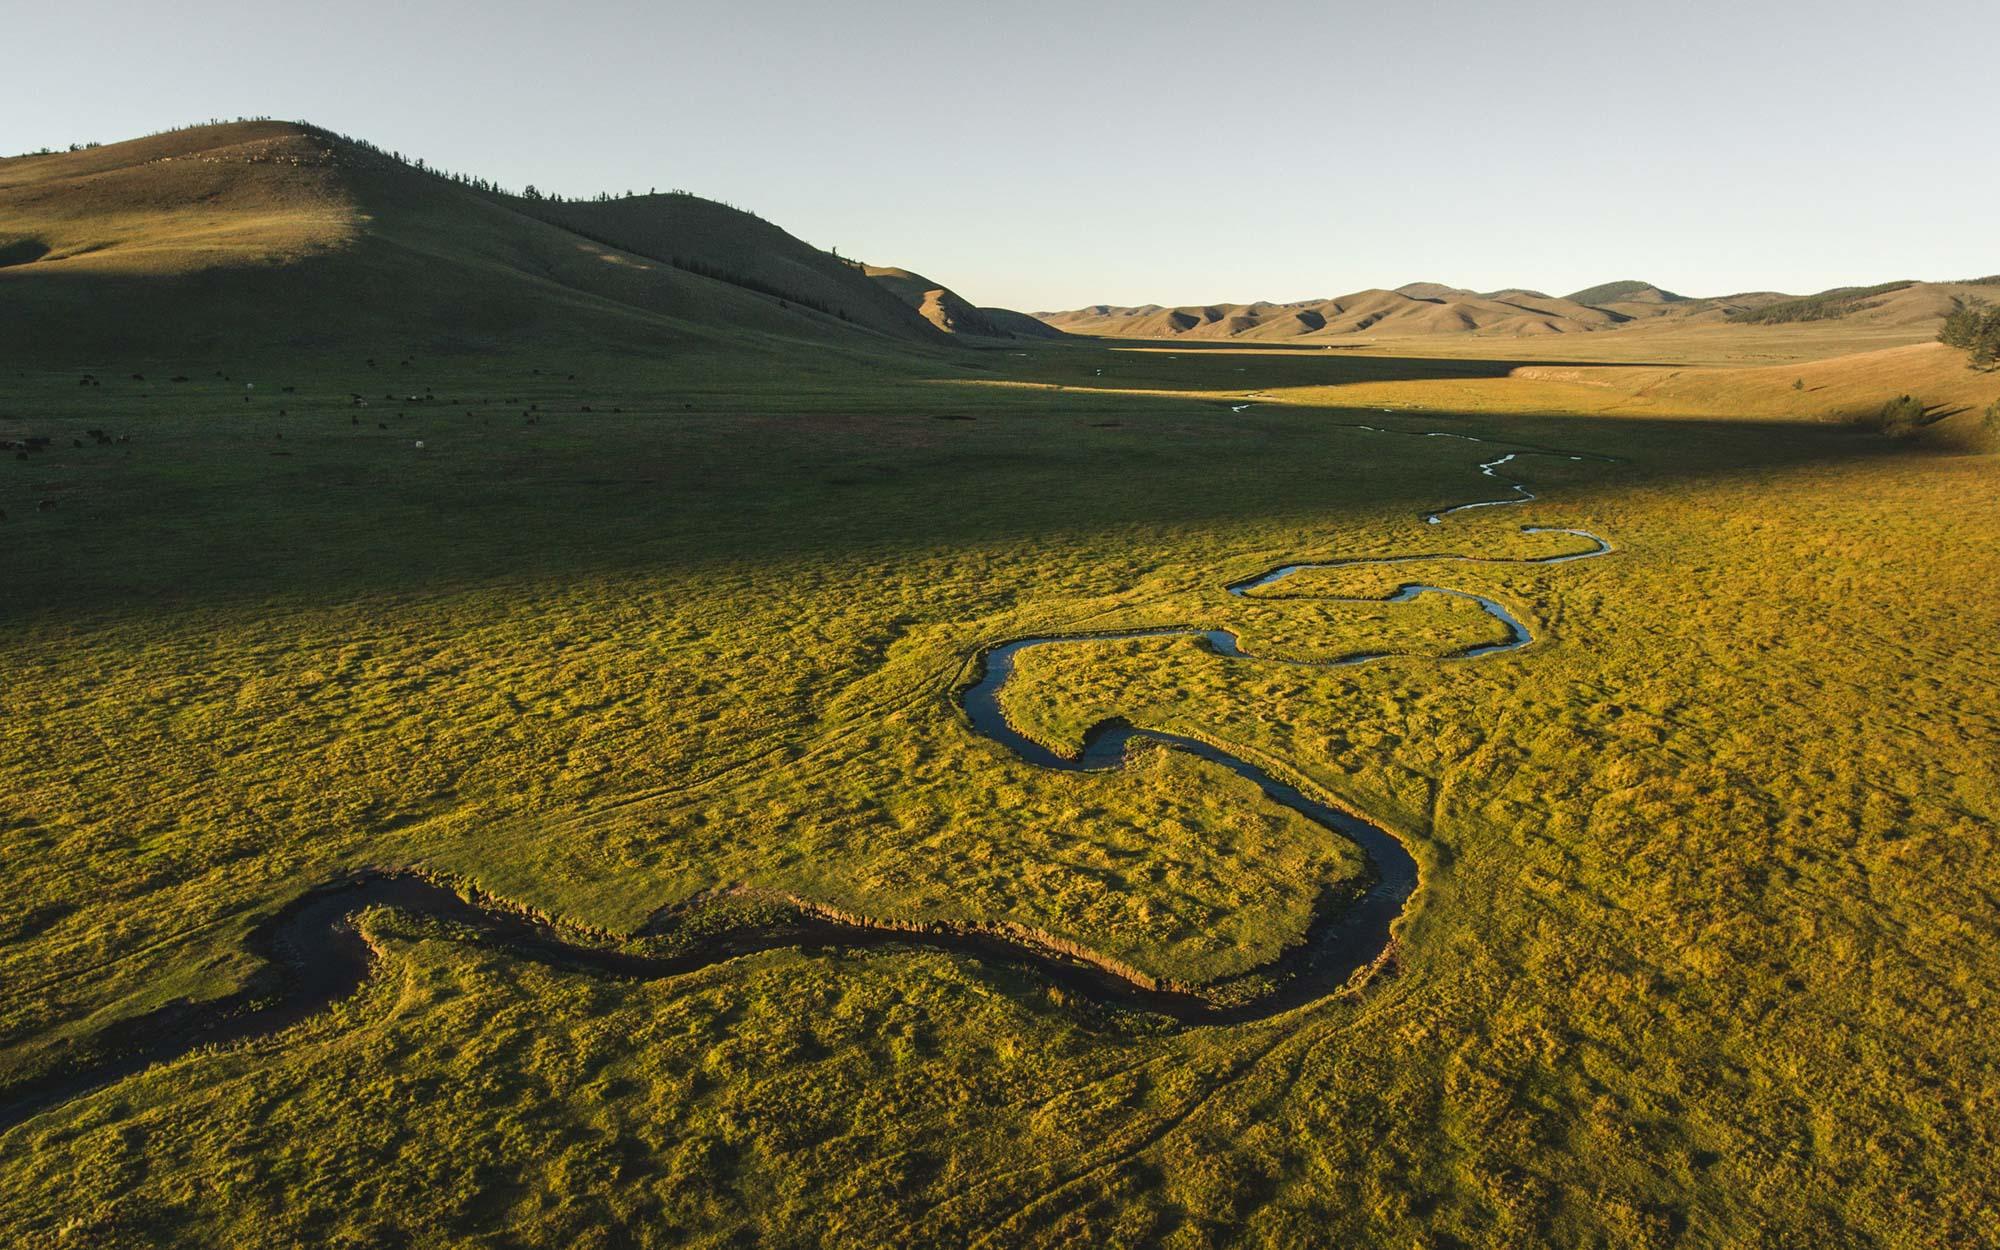 Ecotourisme-voyages-alternatifs-Mongolie-Immersion-4.jpg